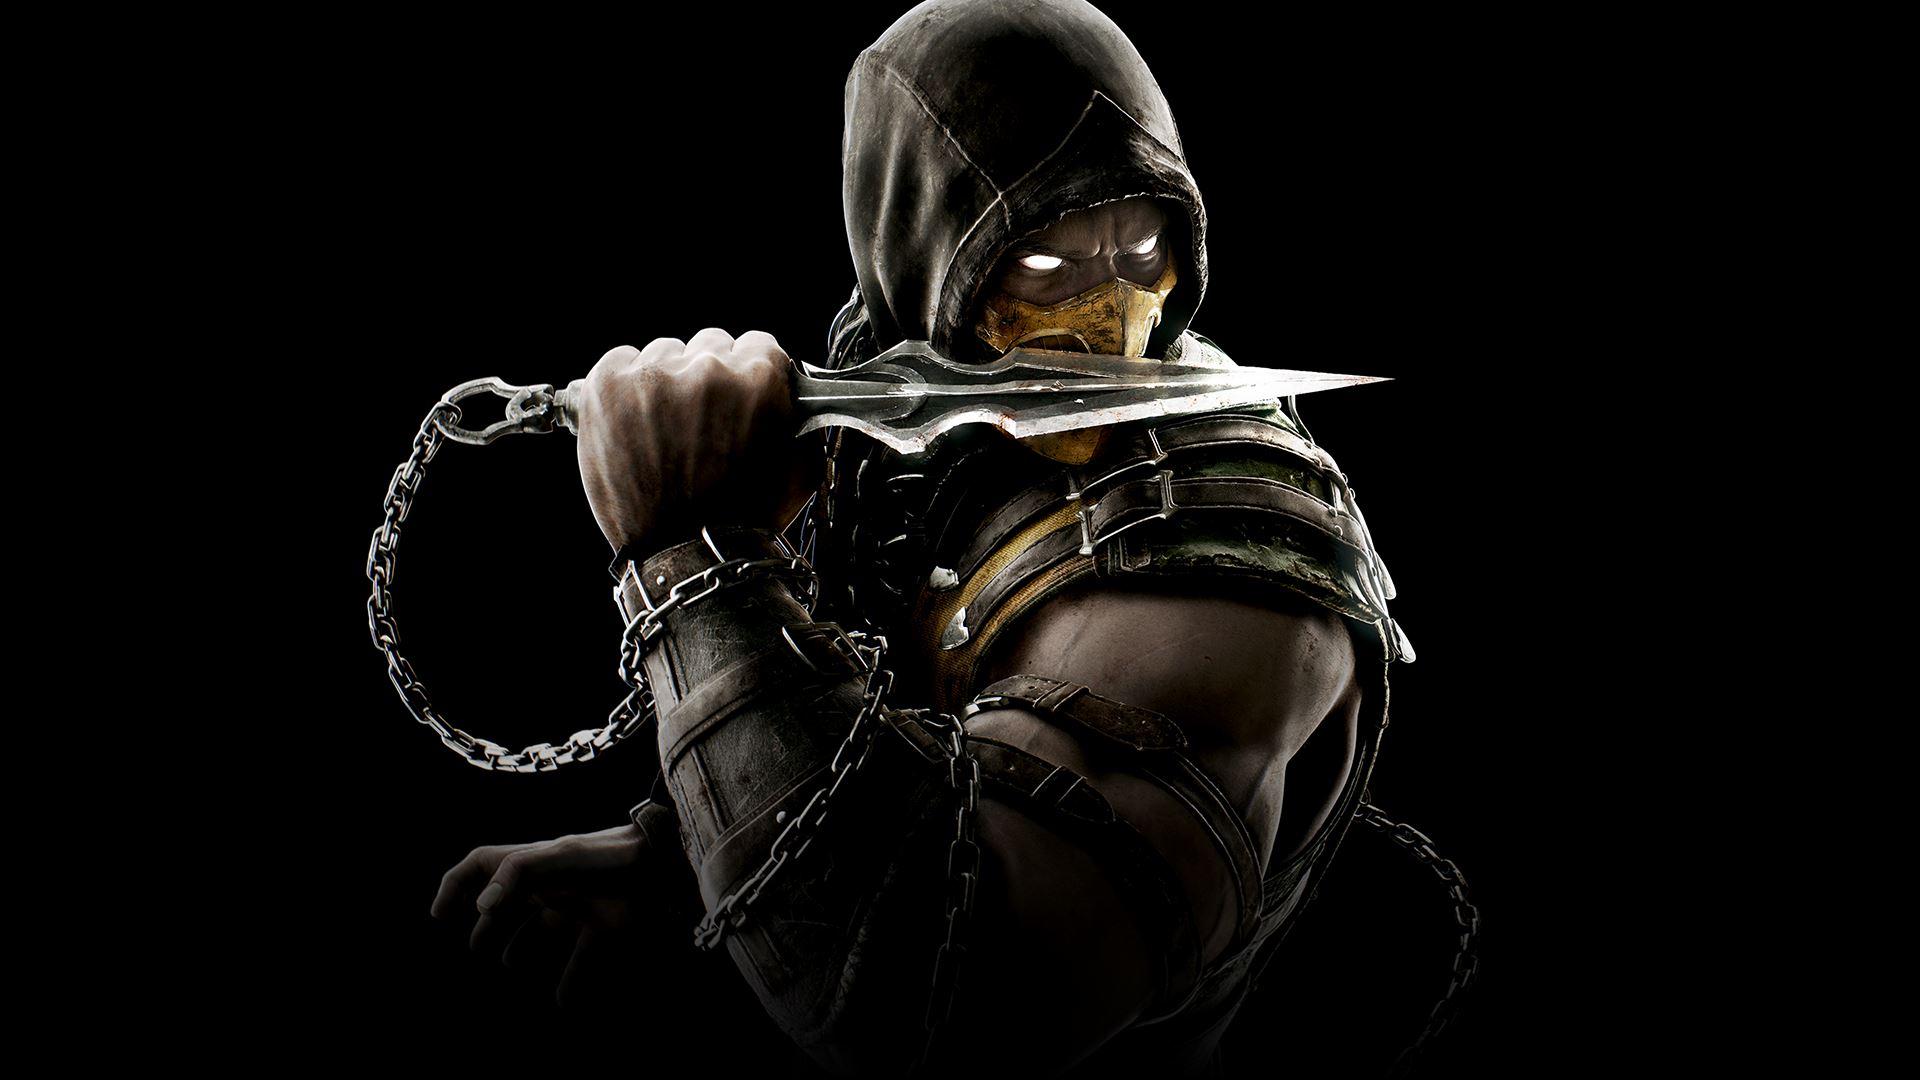 Mortal Kombat X Wallpapers: Mortal Kombat X Wallpapers, Pictures, Images